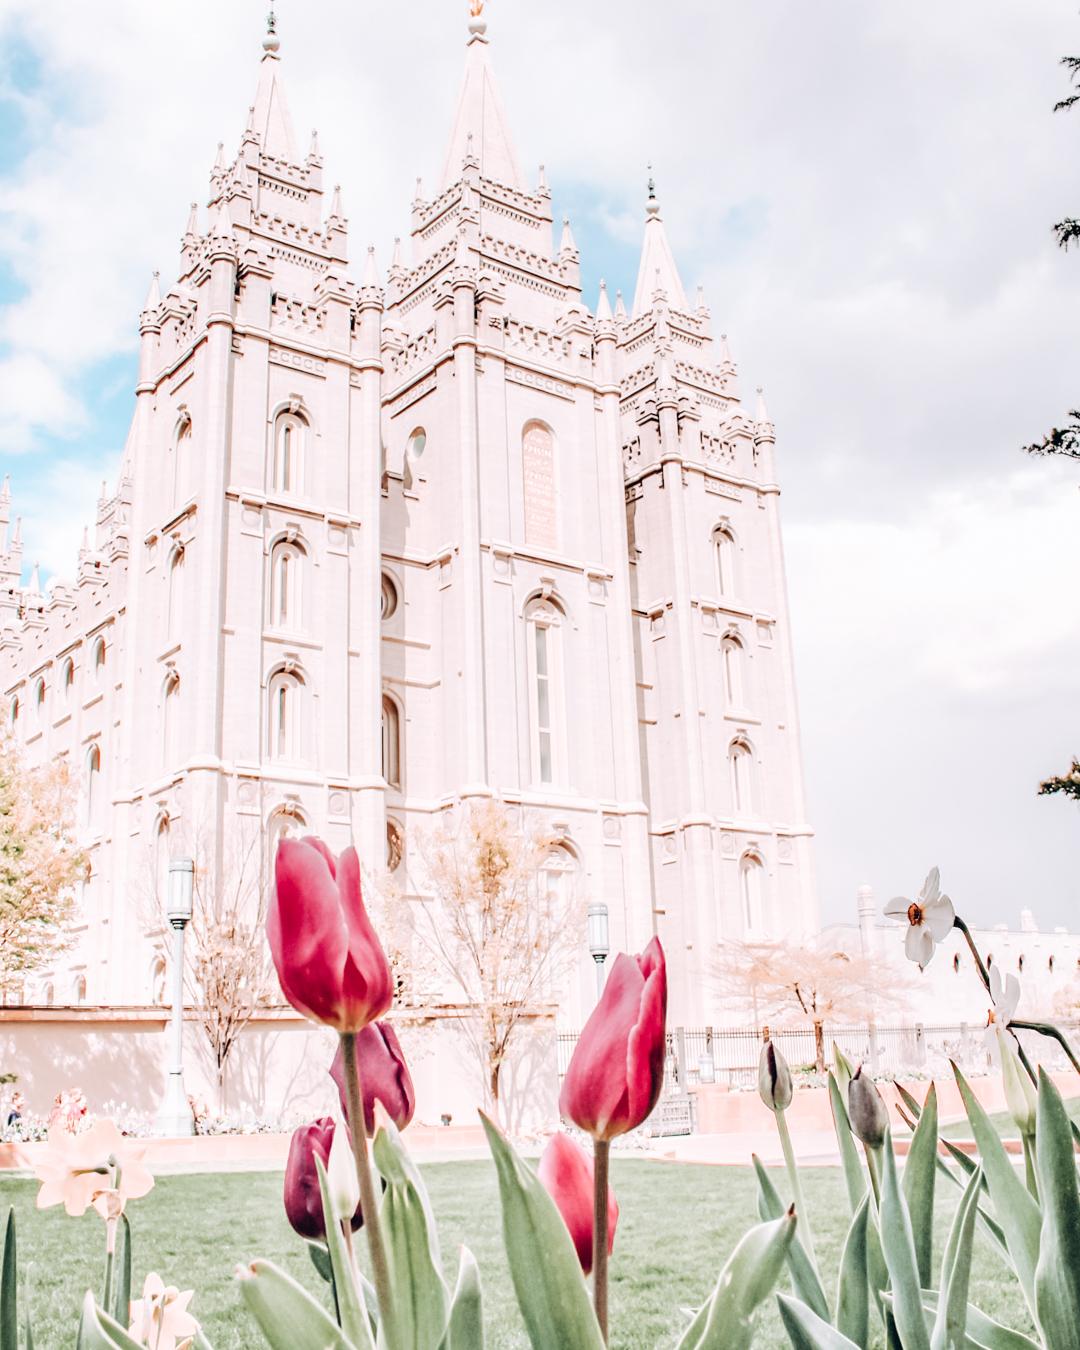 Salt Lake Temple on Temple Square